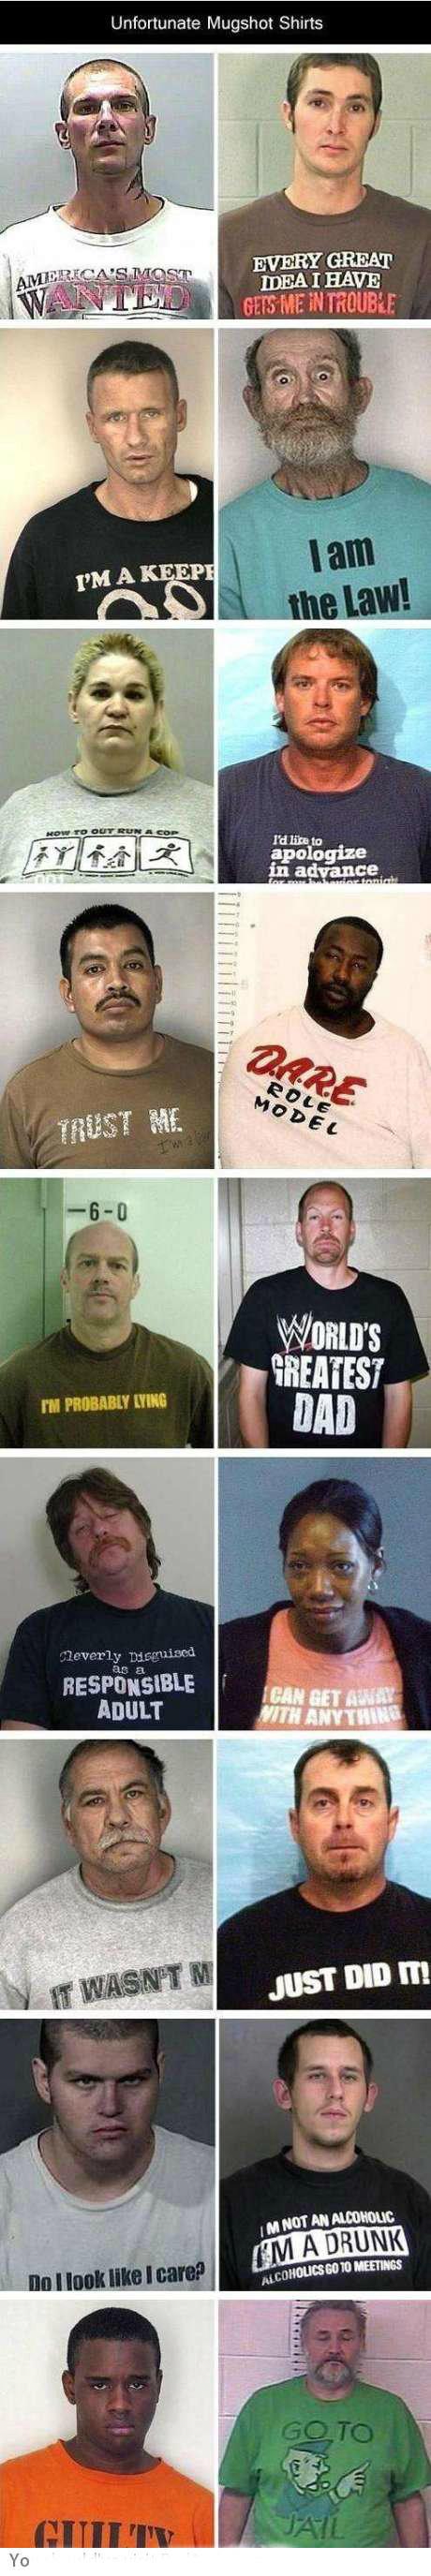 Unfortunate Mugshot Shirts. . Unfortunate Mugshot Shirts ADULT unfortunate shirts mugshots